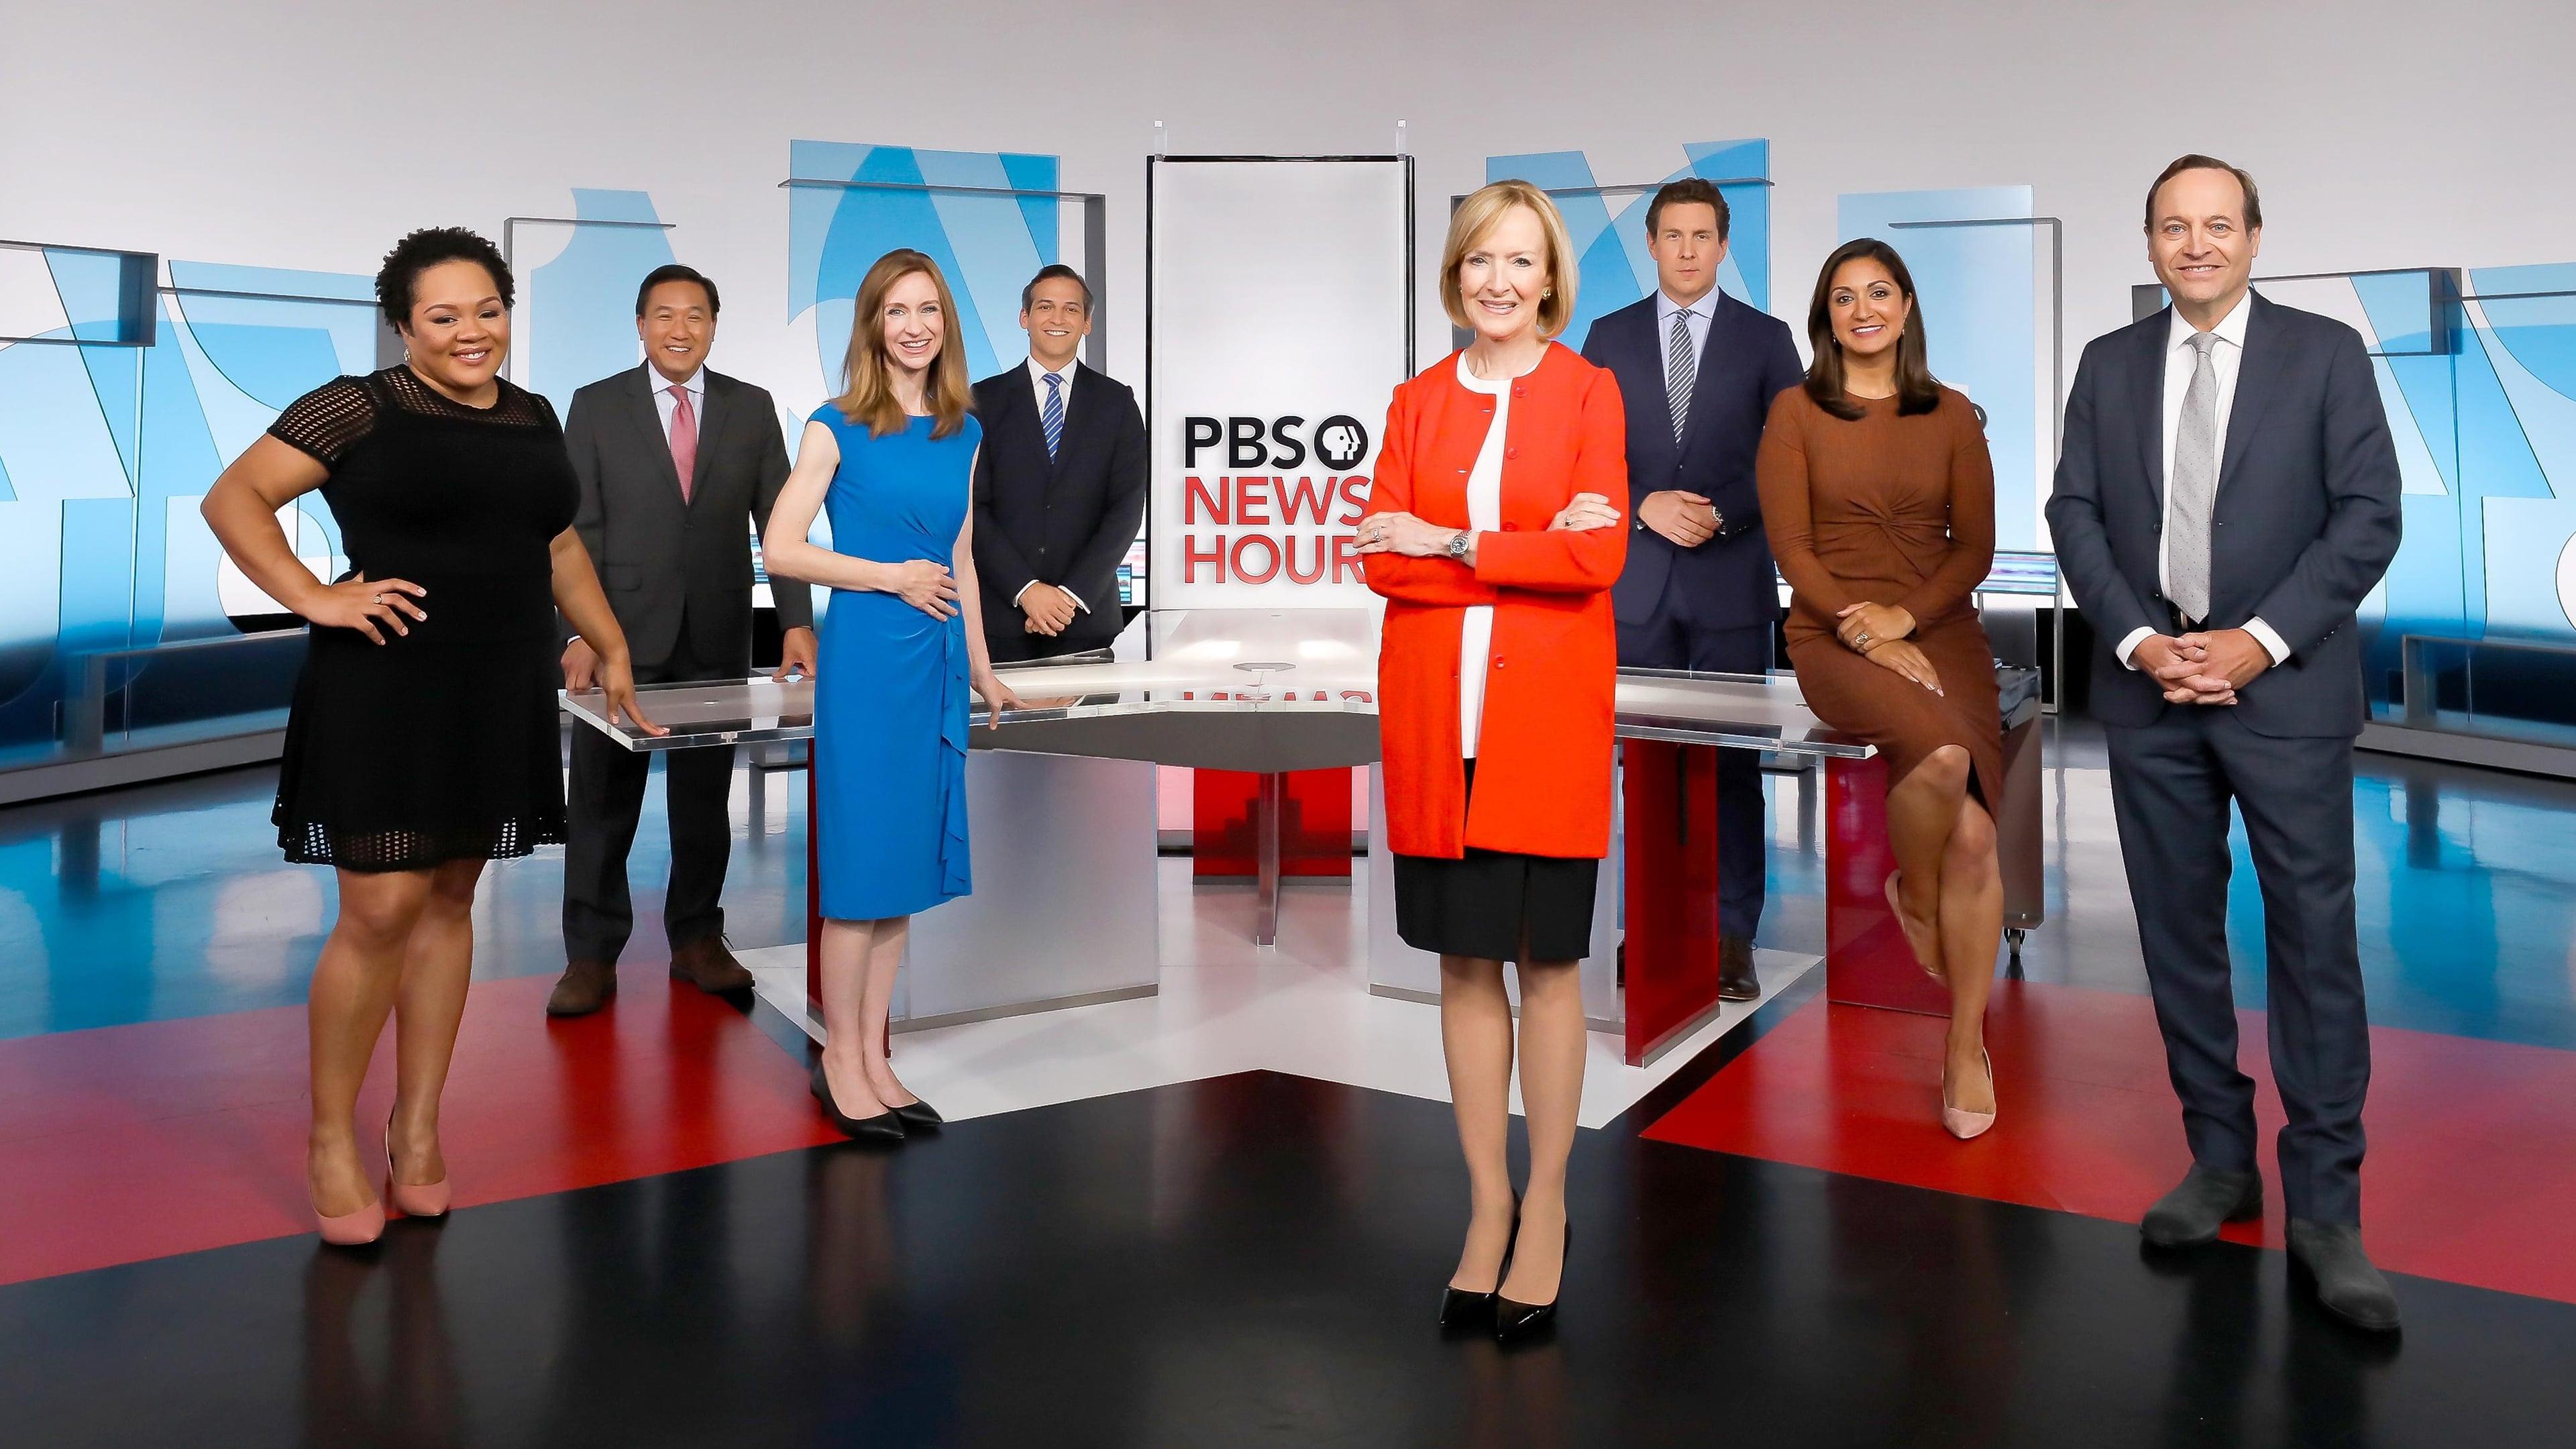 PBS NewsHour - Season 42 Episode 69